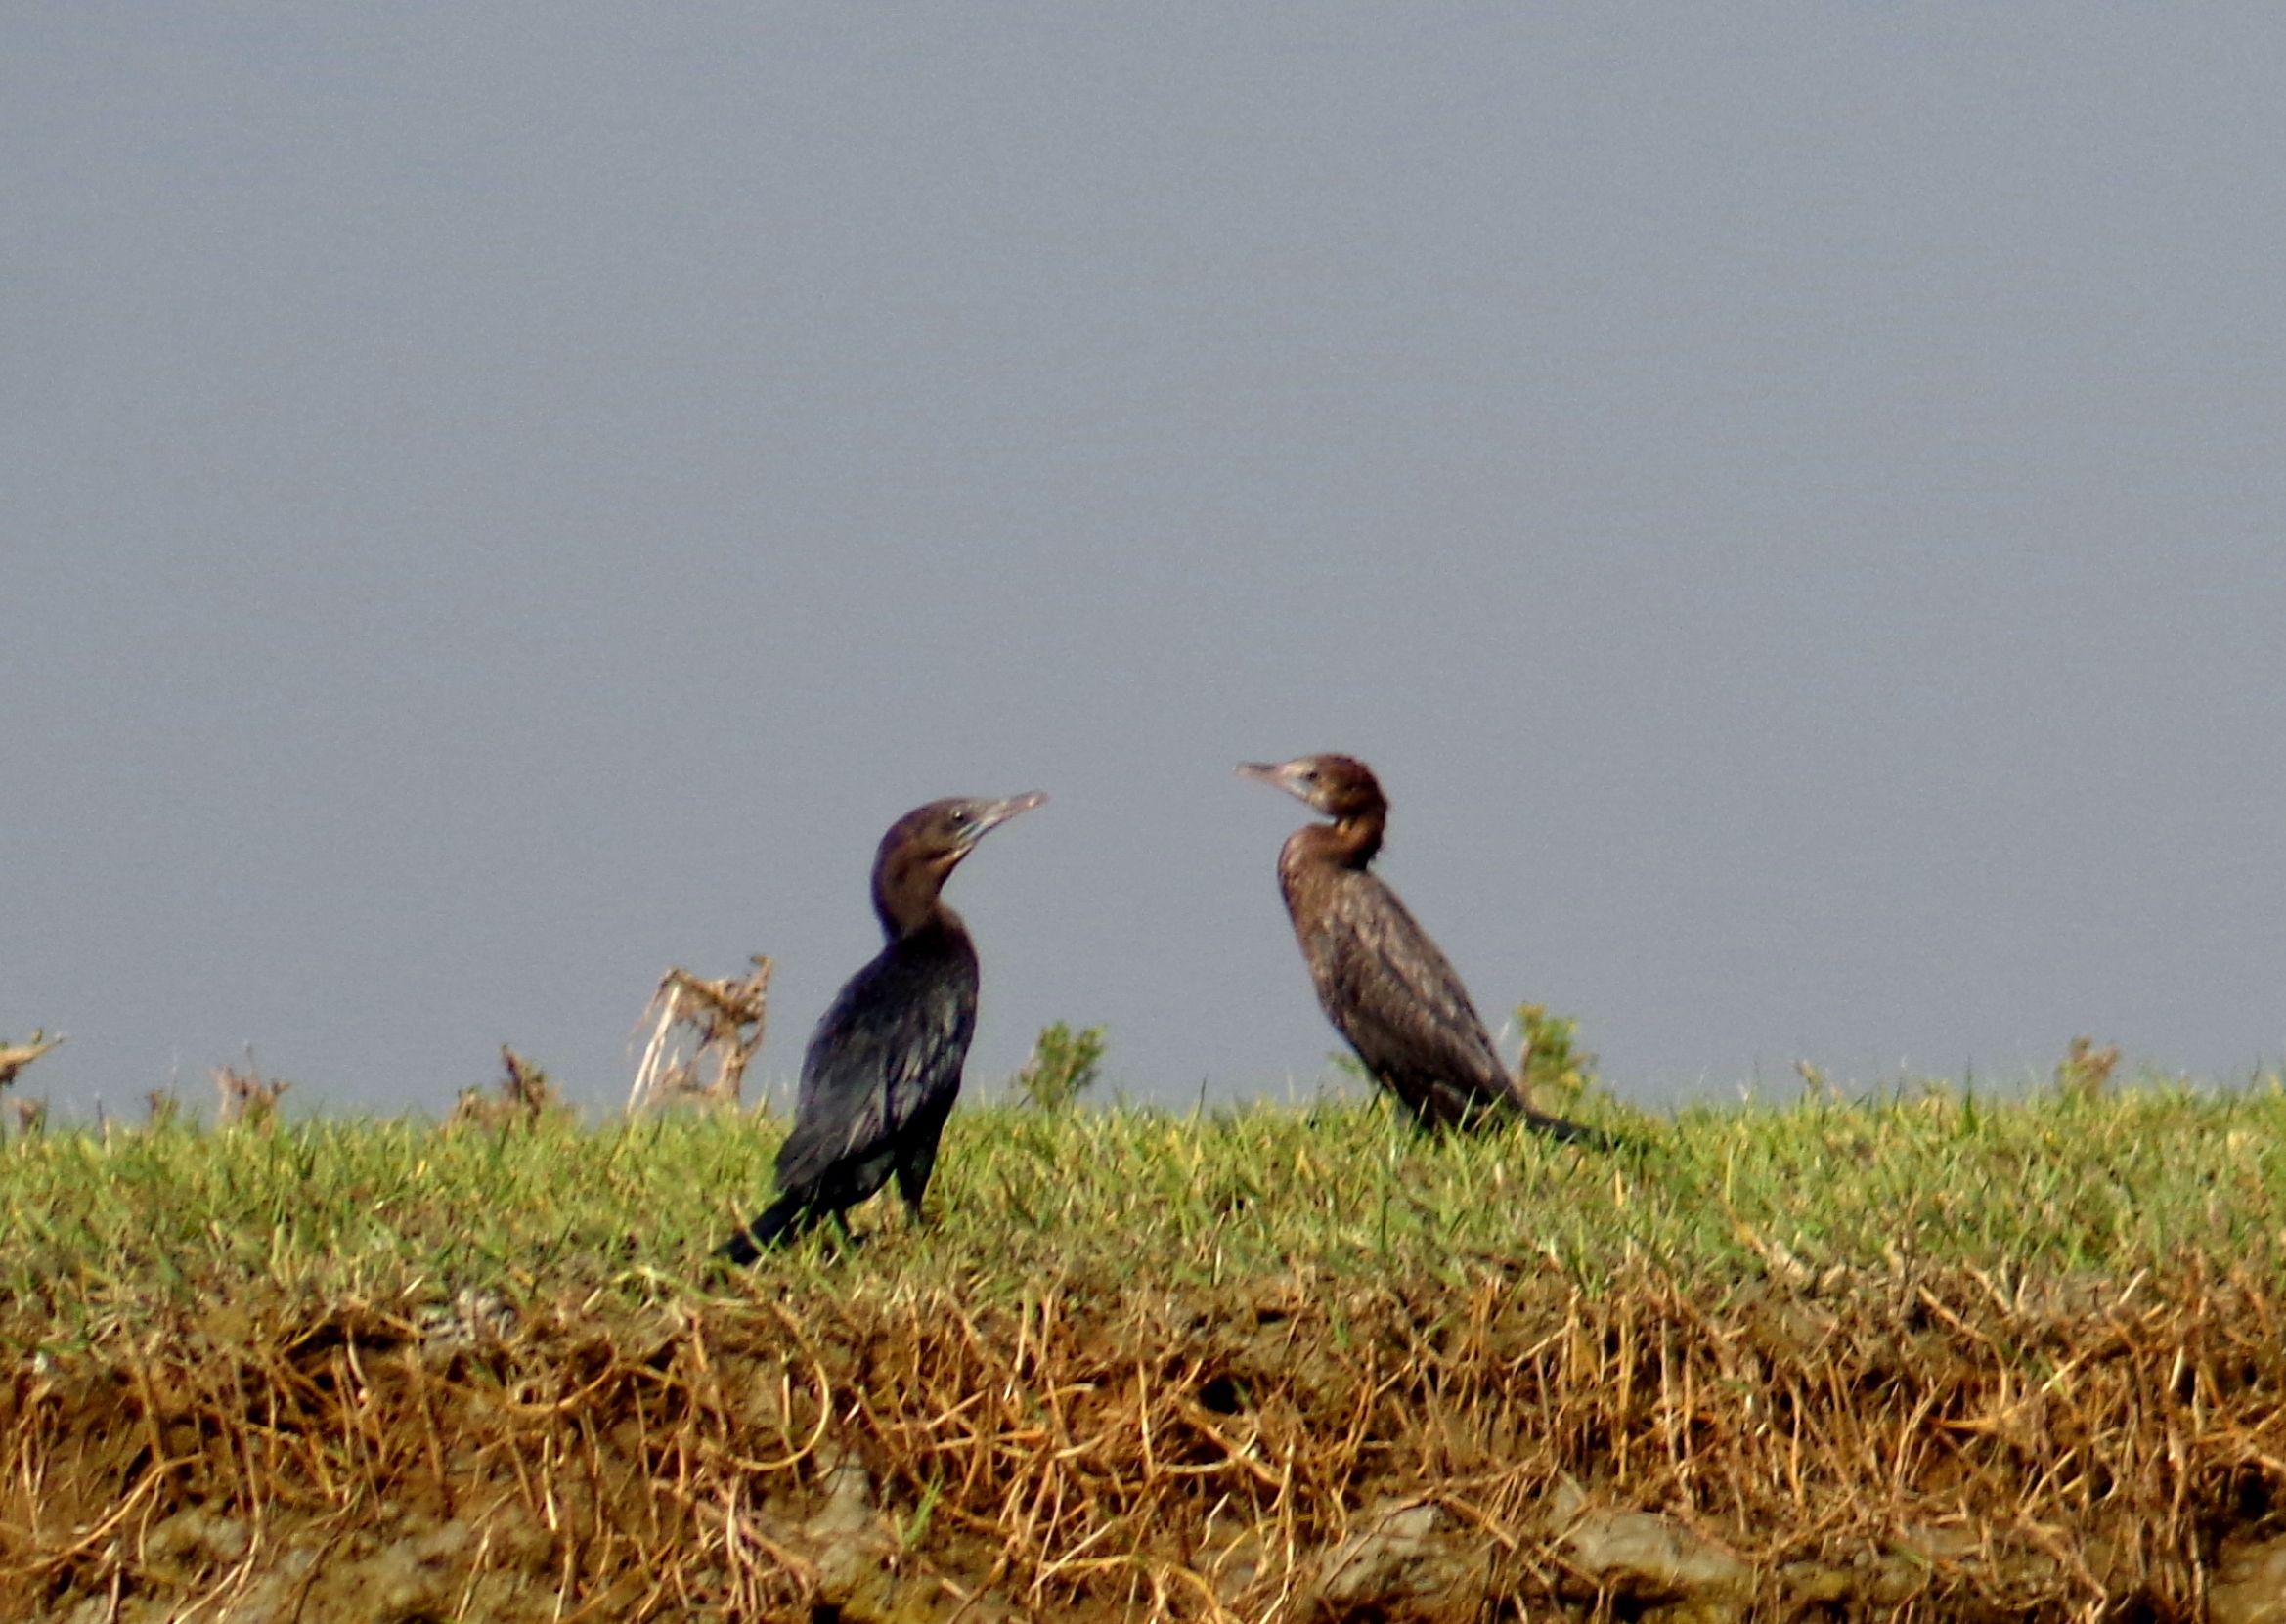 Bengali Name পানকৌড়ি English name Indian Cormorant